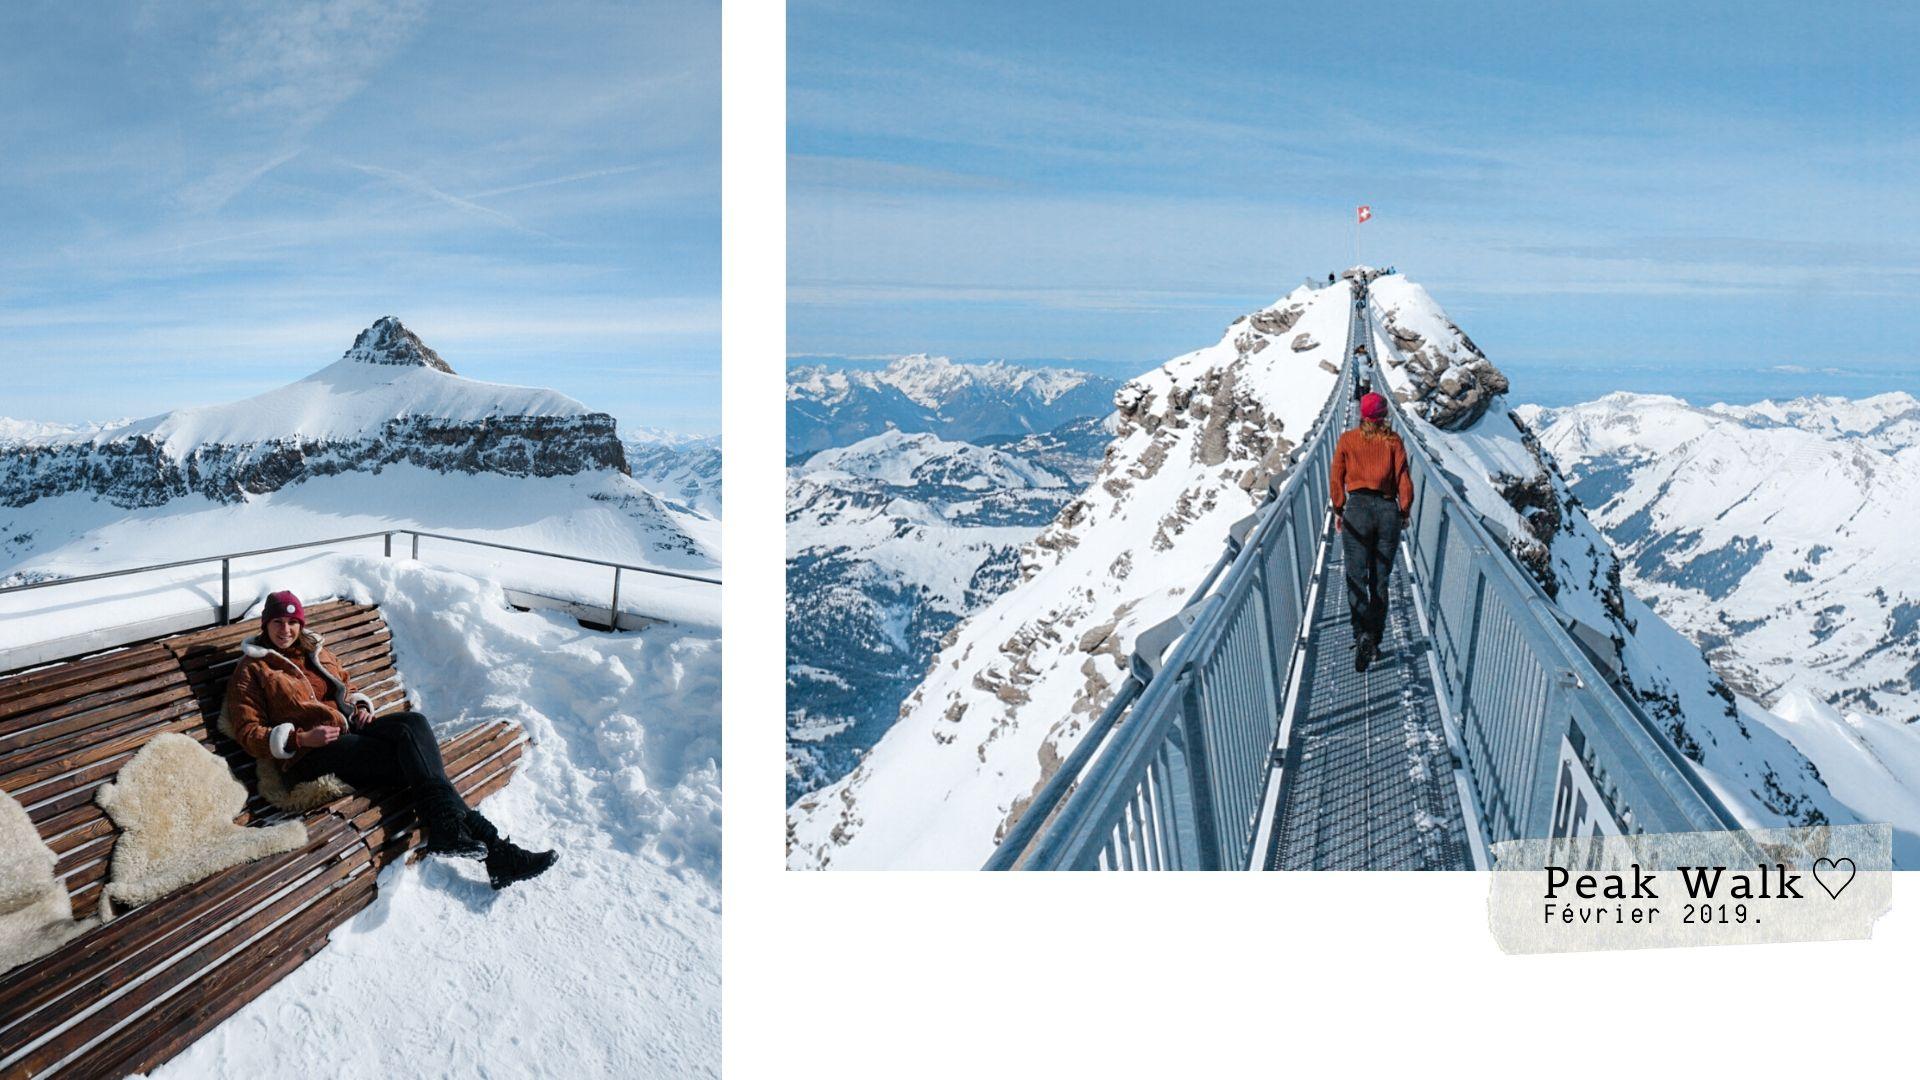 peak walk suisse 3000 attraction